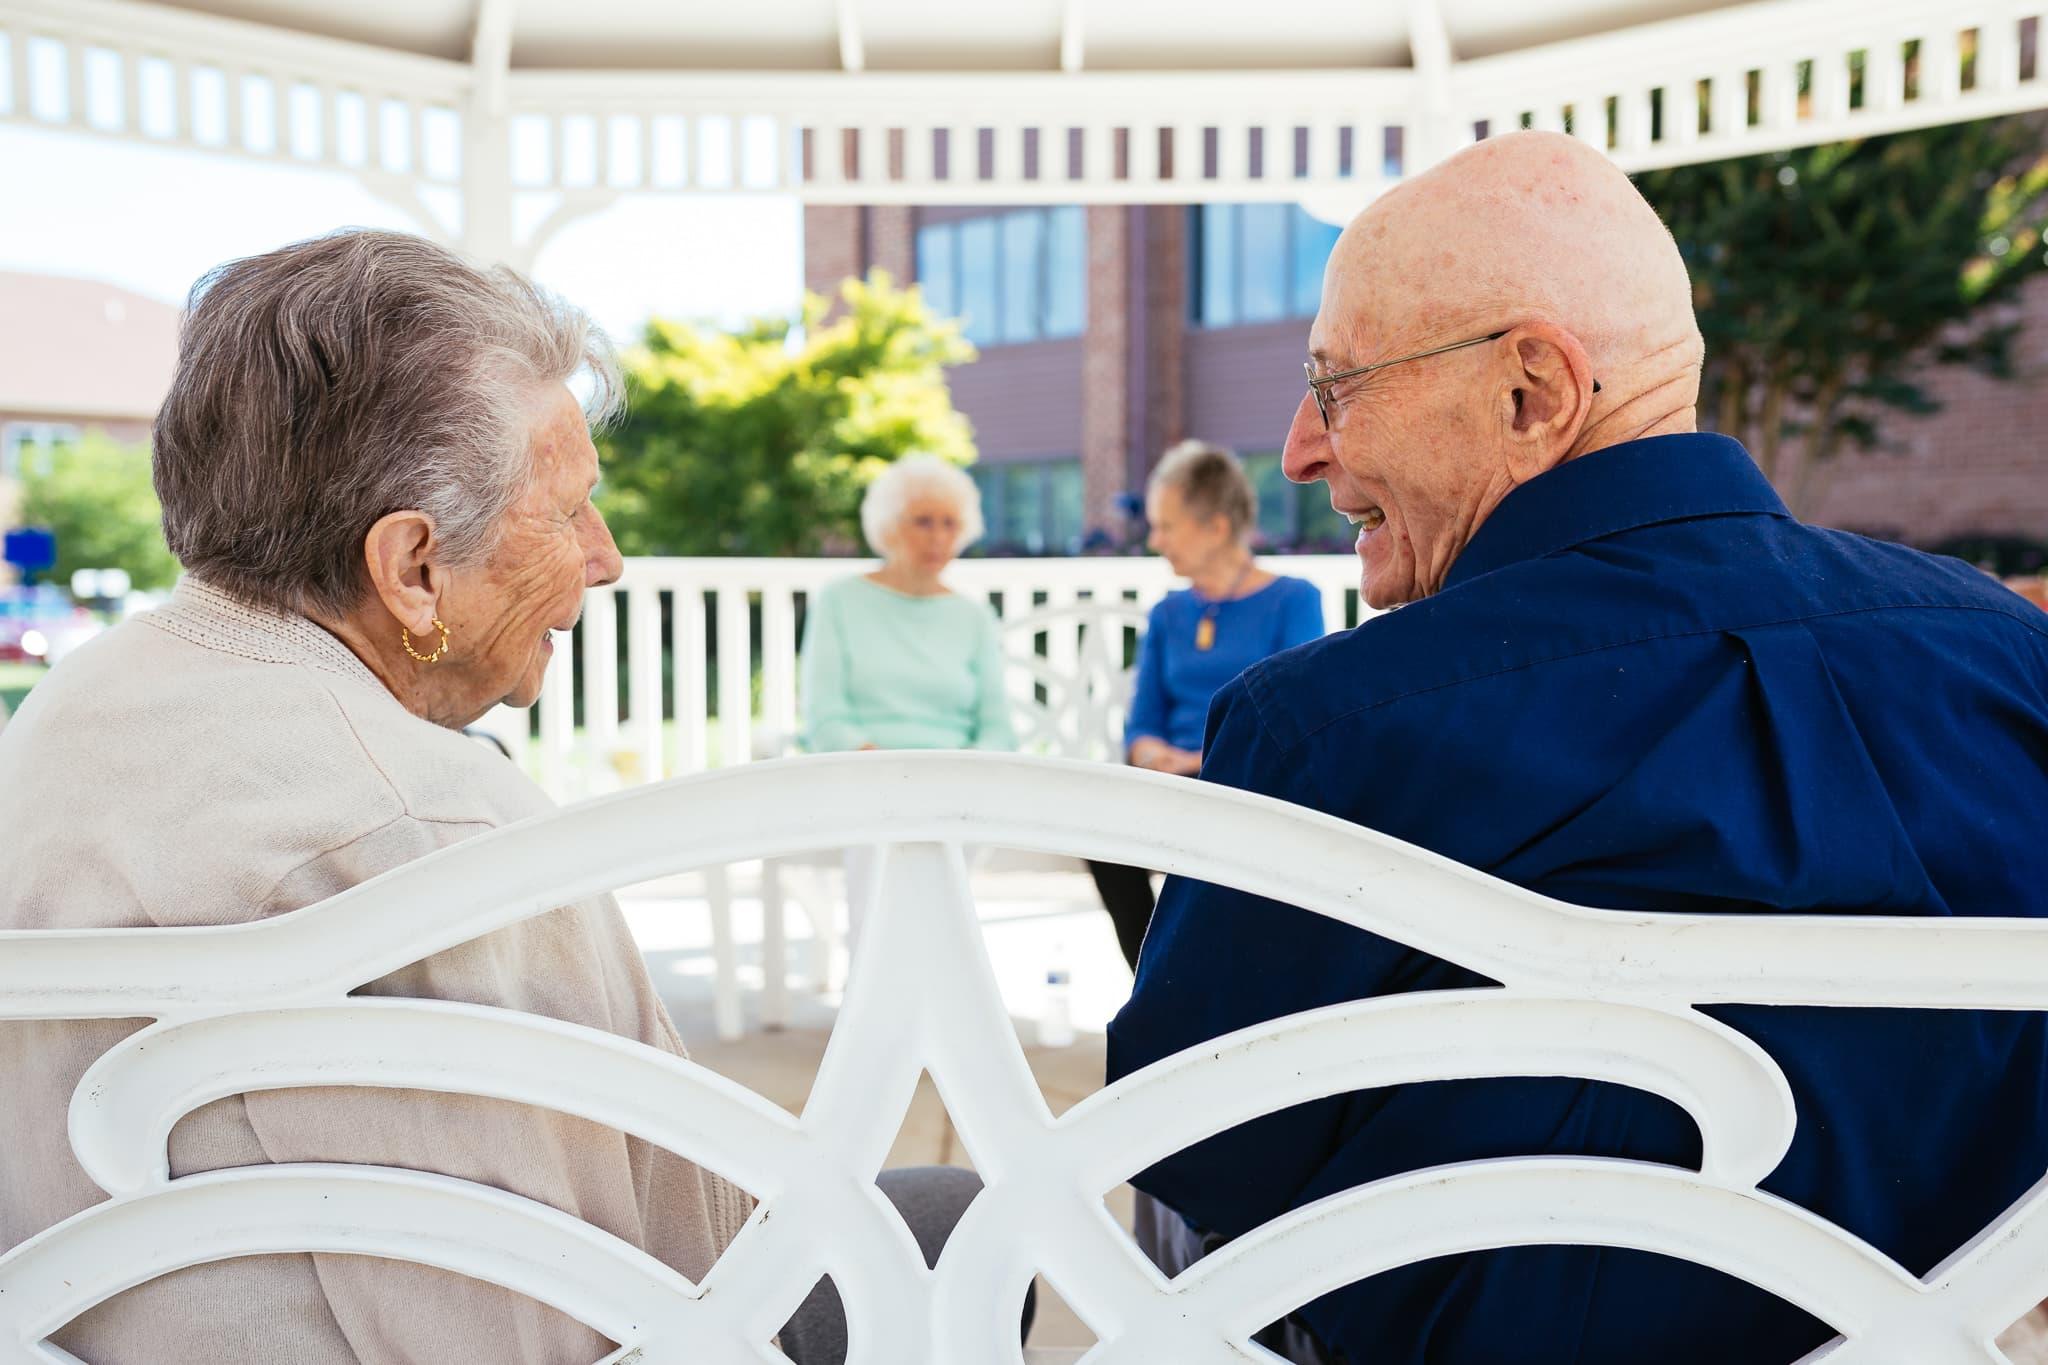 Couple, gazebo, park bench, seniors, friends talking